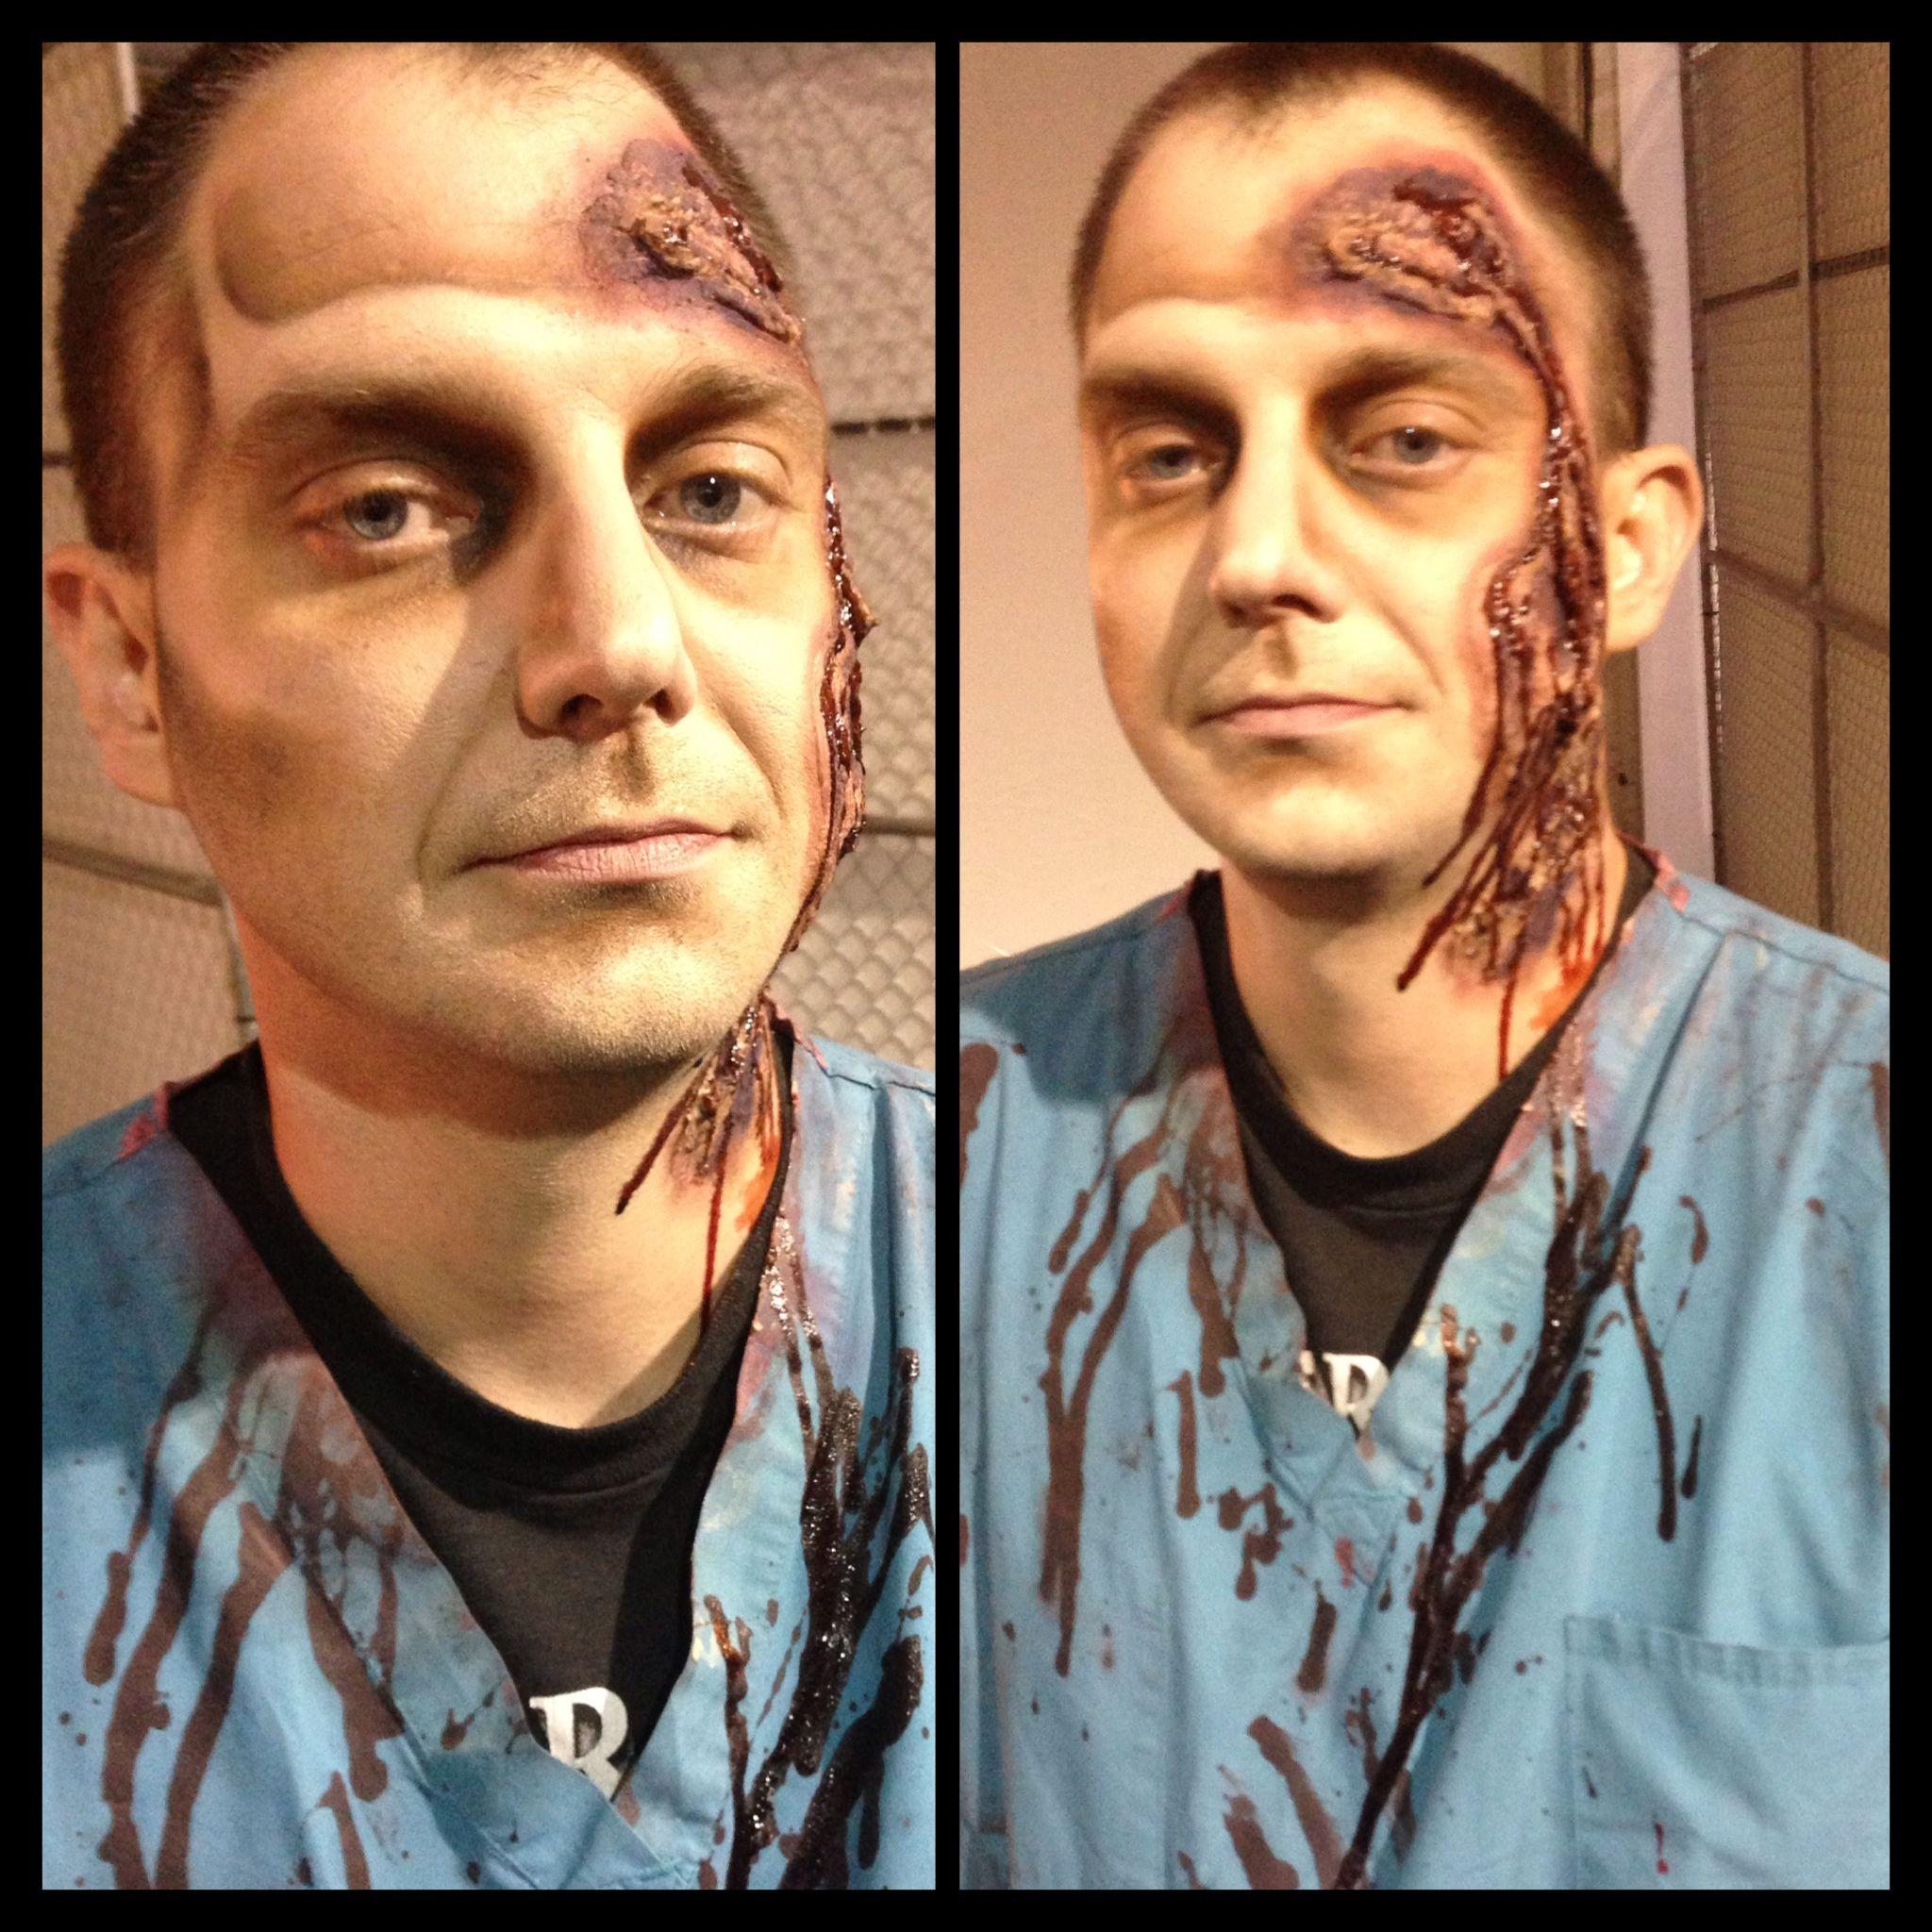 Zombie/wound makeup. MUA: Becki Morgan. #zombie #halloween #halloweenmakeup #makeup #makeupartist #scary #blood